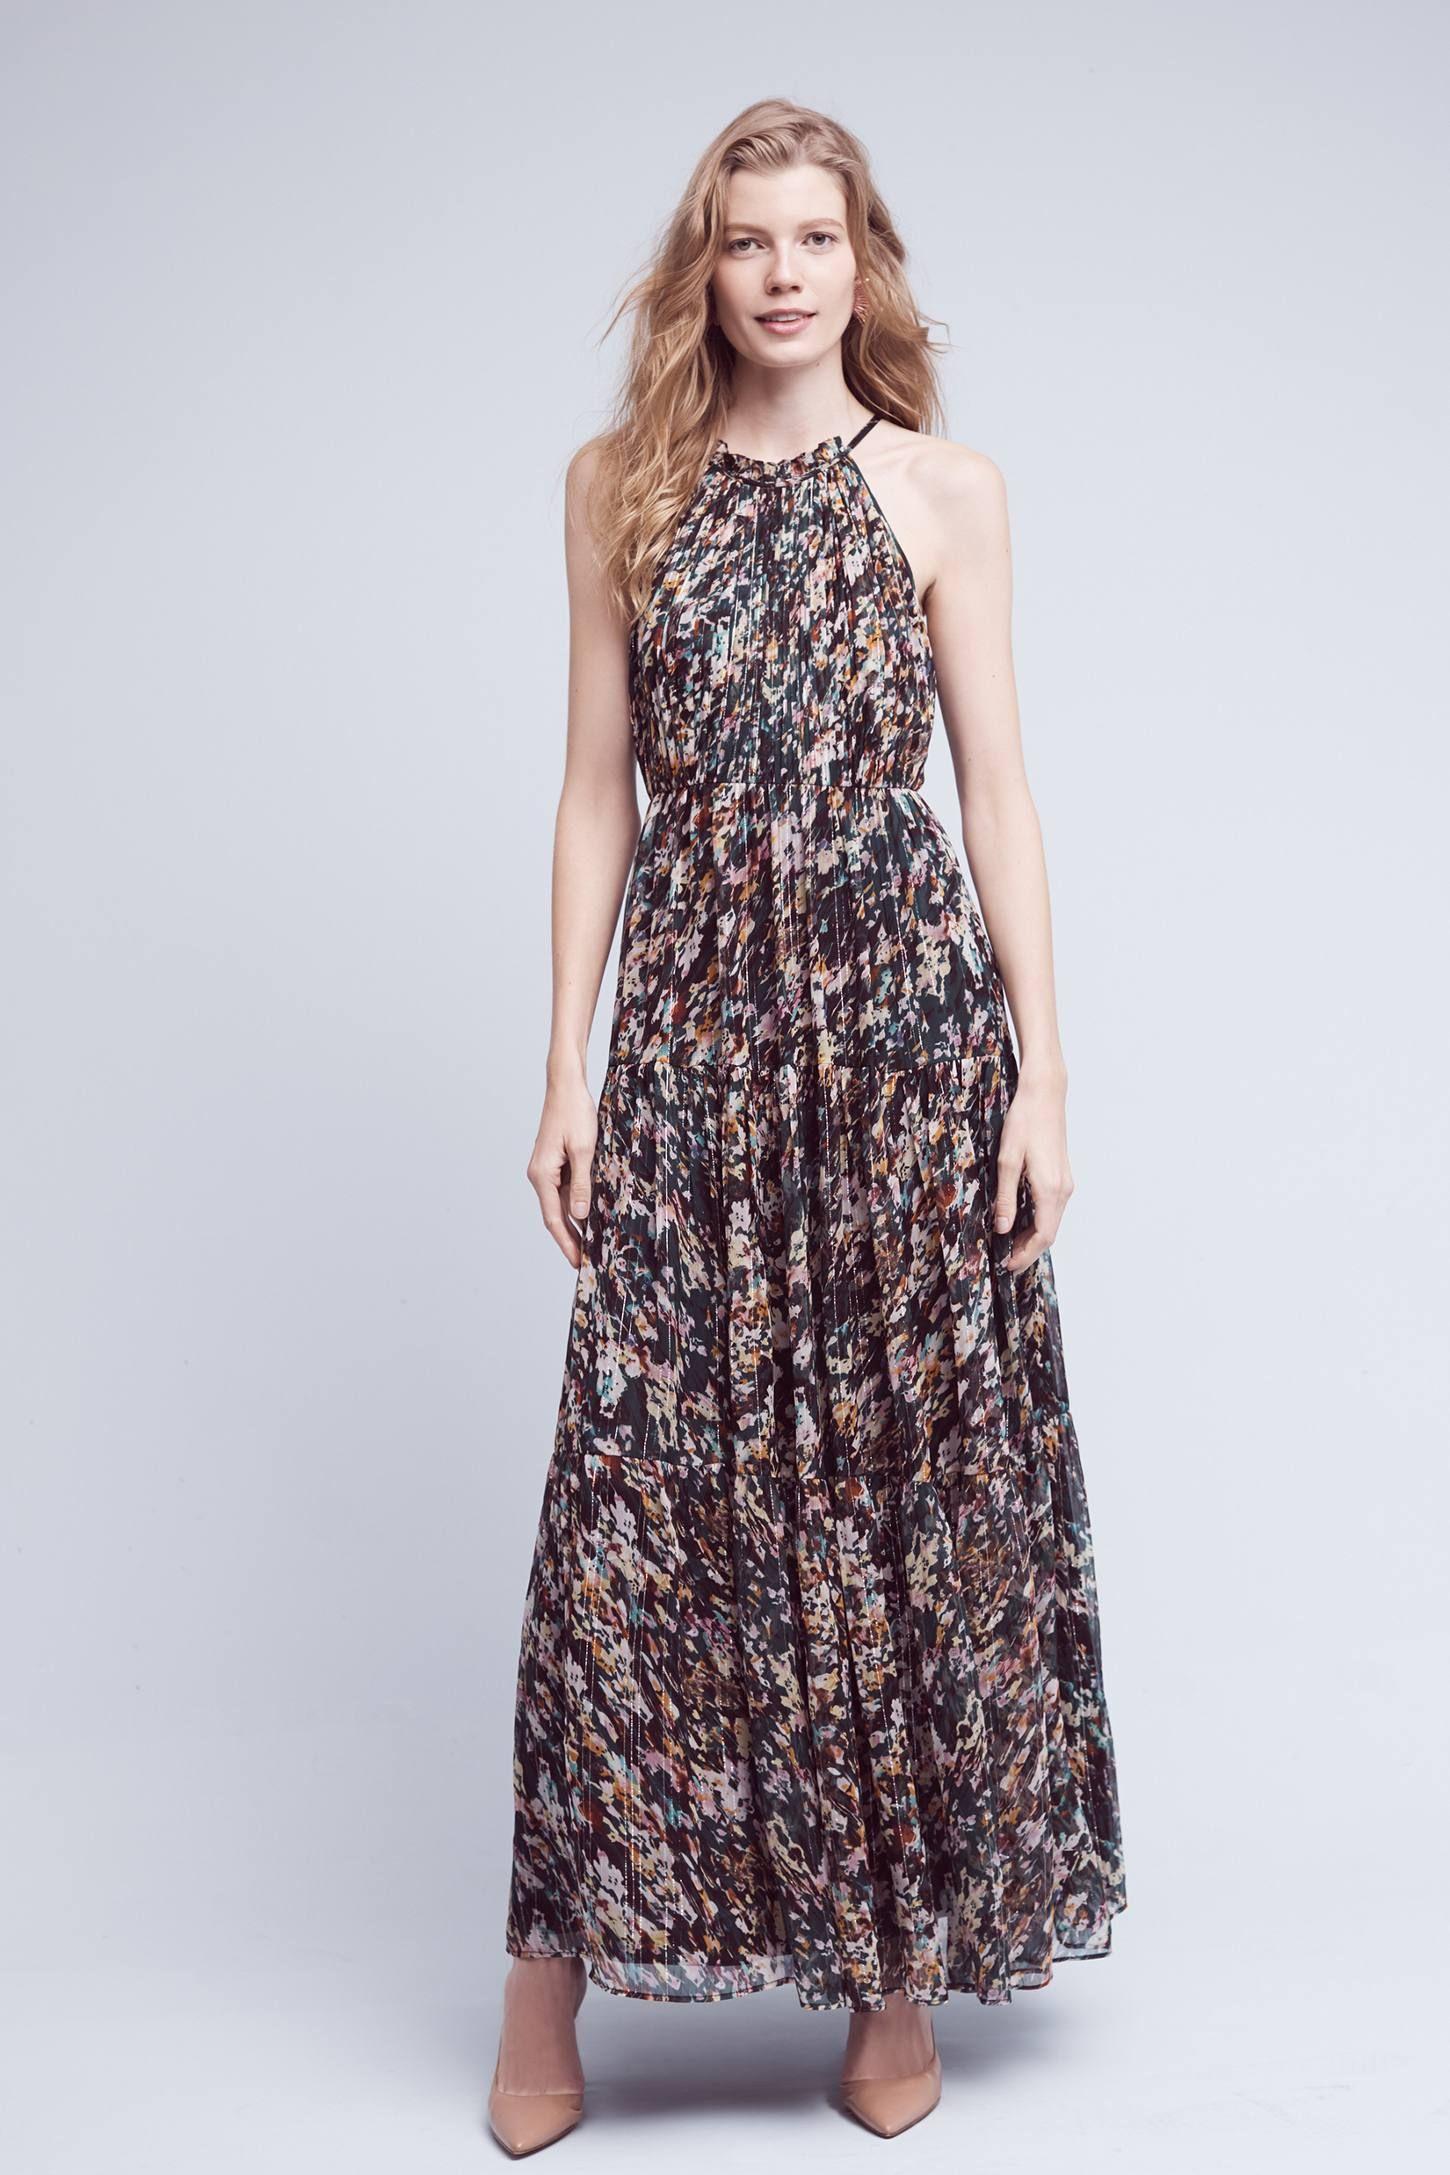 Larina Ruffled Maxi Dress Wedding Guest Pinterest Maxi dresses